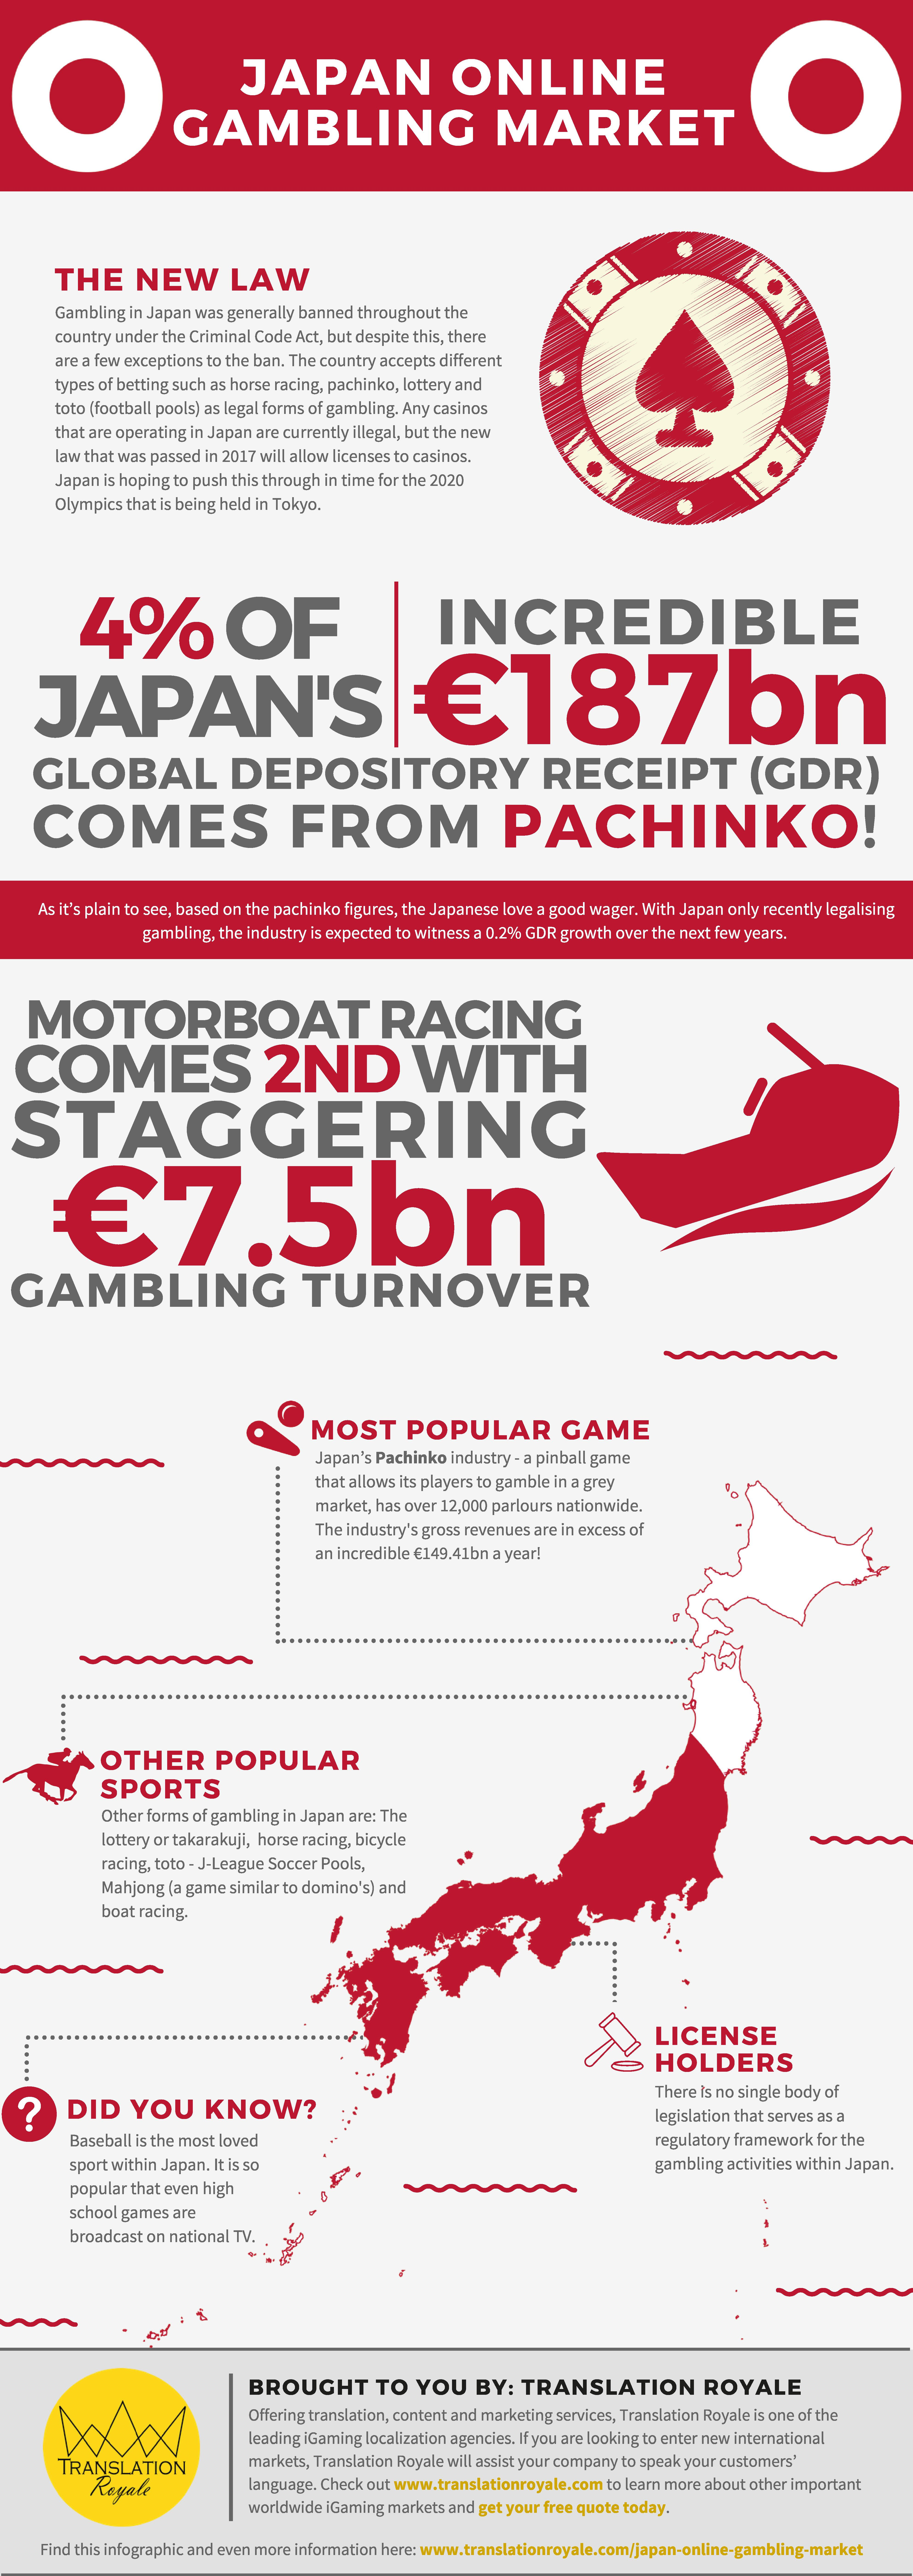 Japan Online Gambling Market Infographic